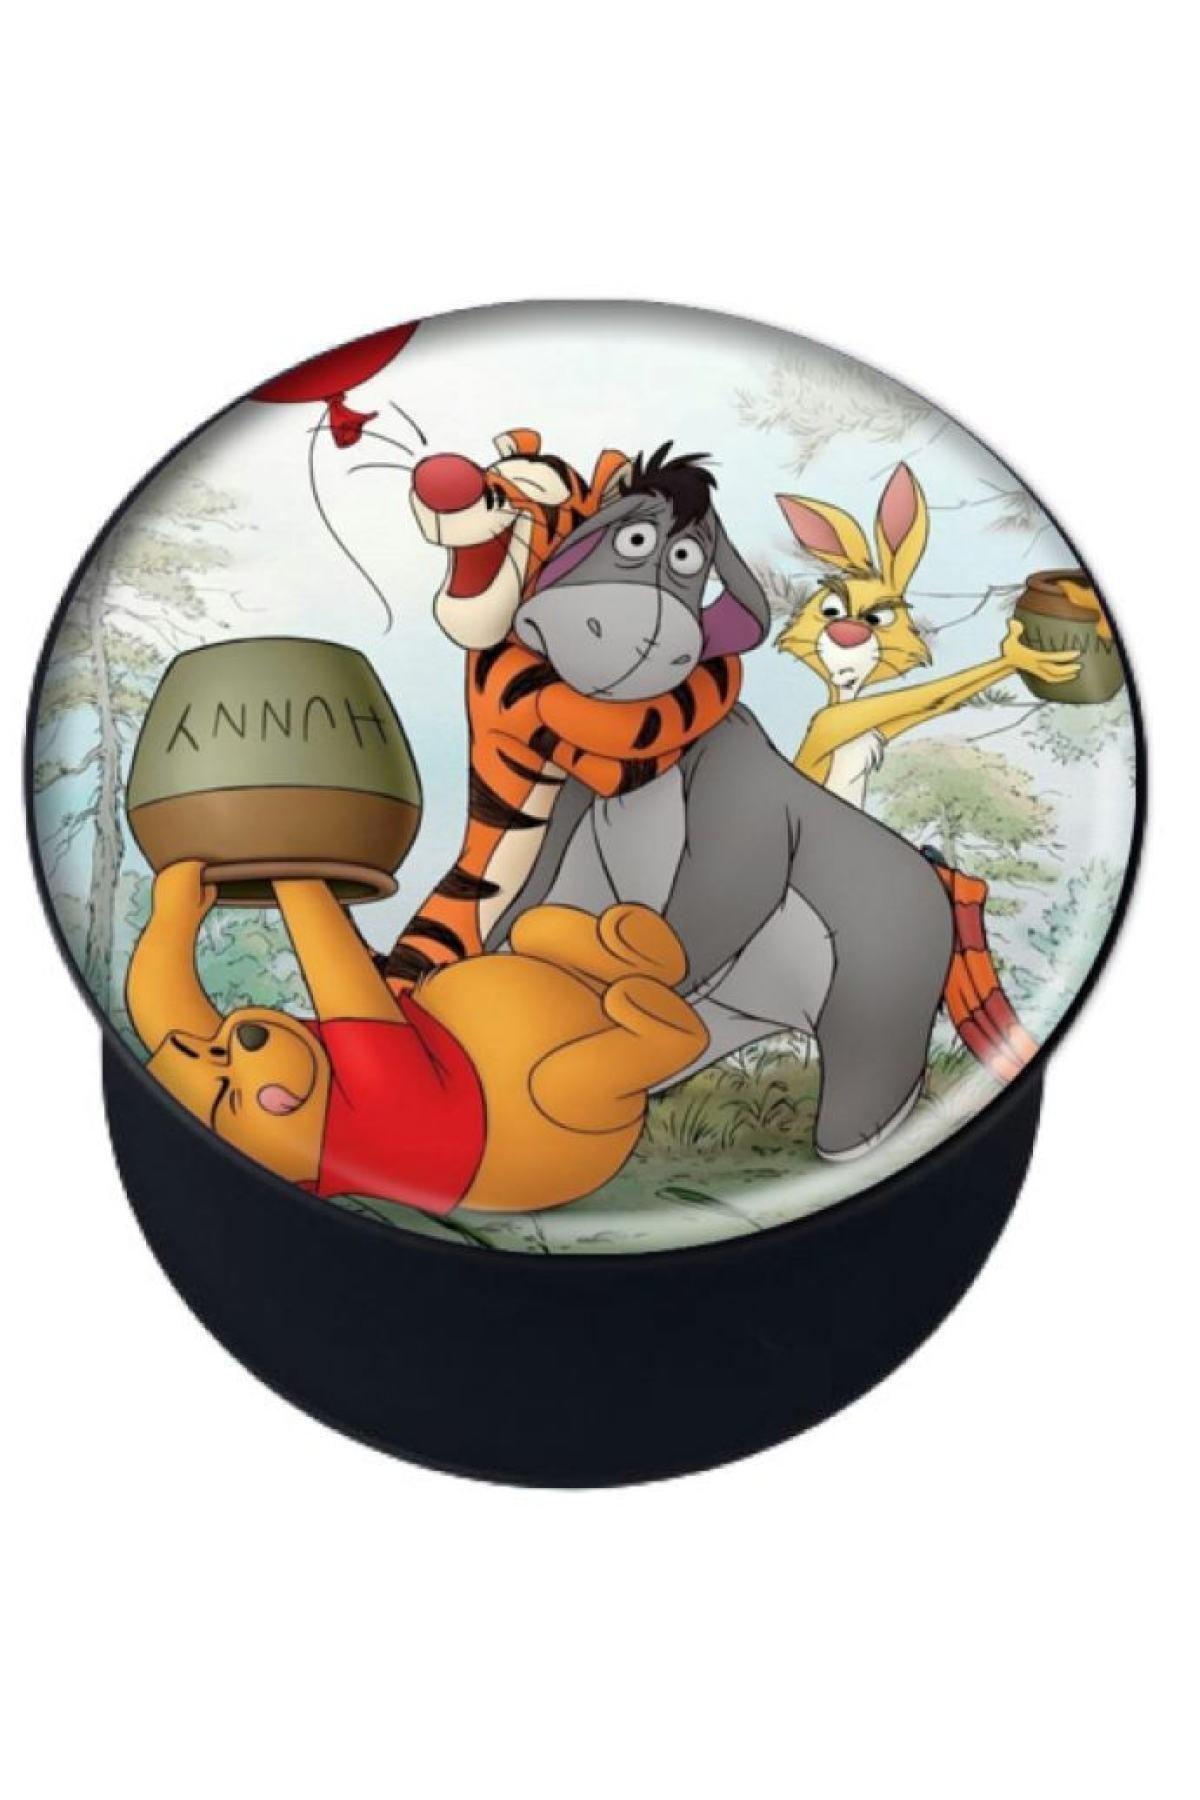 AVS KILIF Winnie The Pooh Telefon Parmak Tutucu Popsocket 1